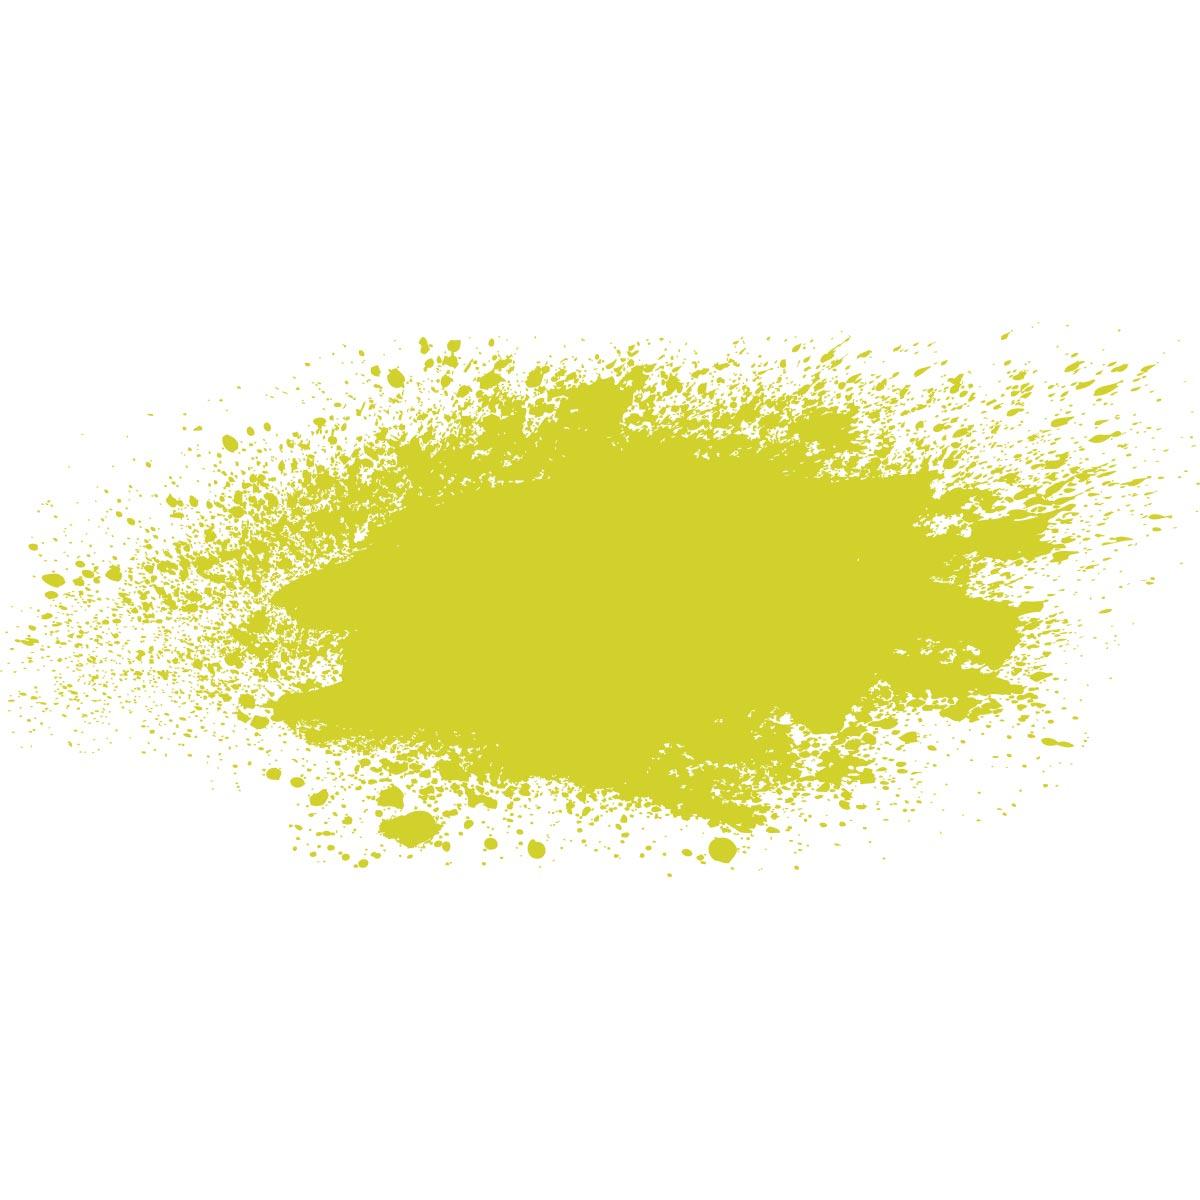 FolkArt ® Stencil Spray™ Acrylic Paint - Lime Green, 2 oz.